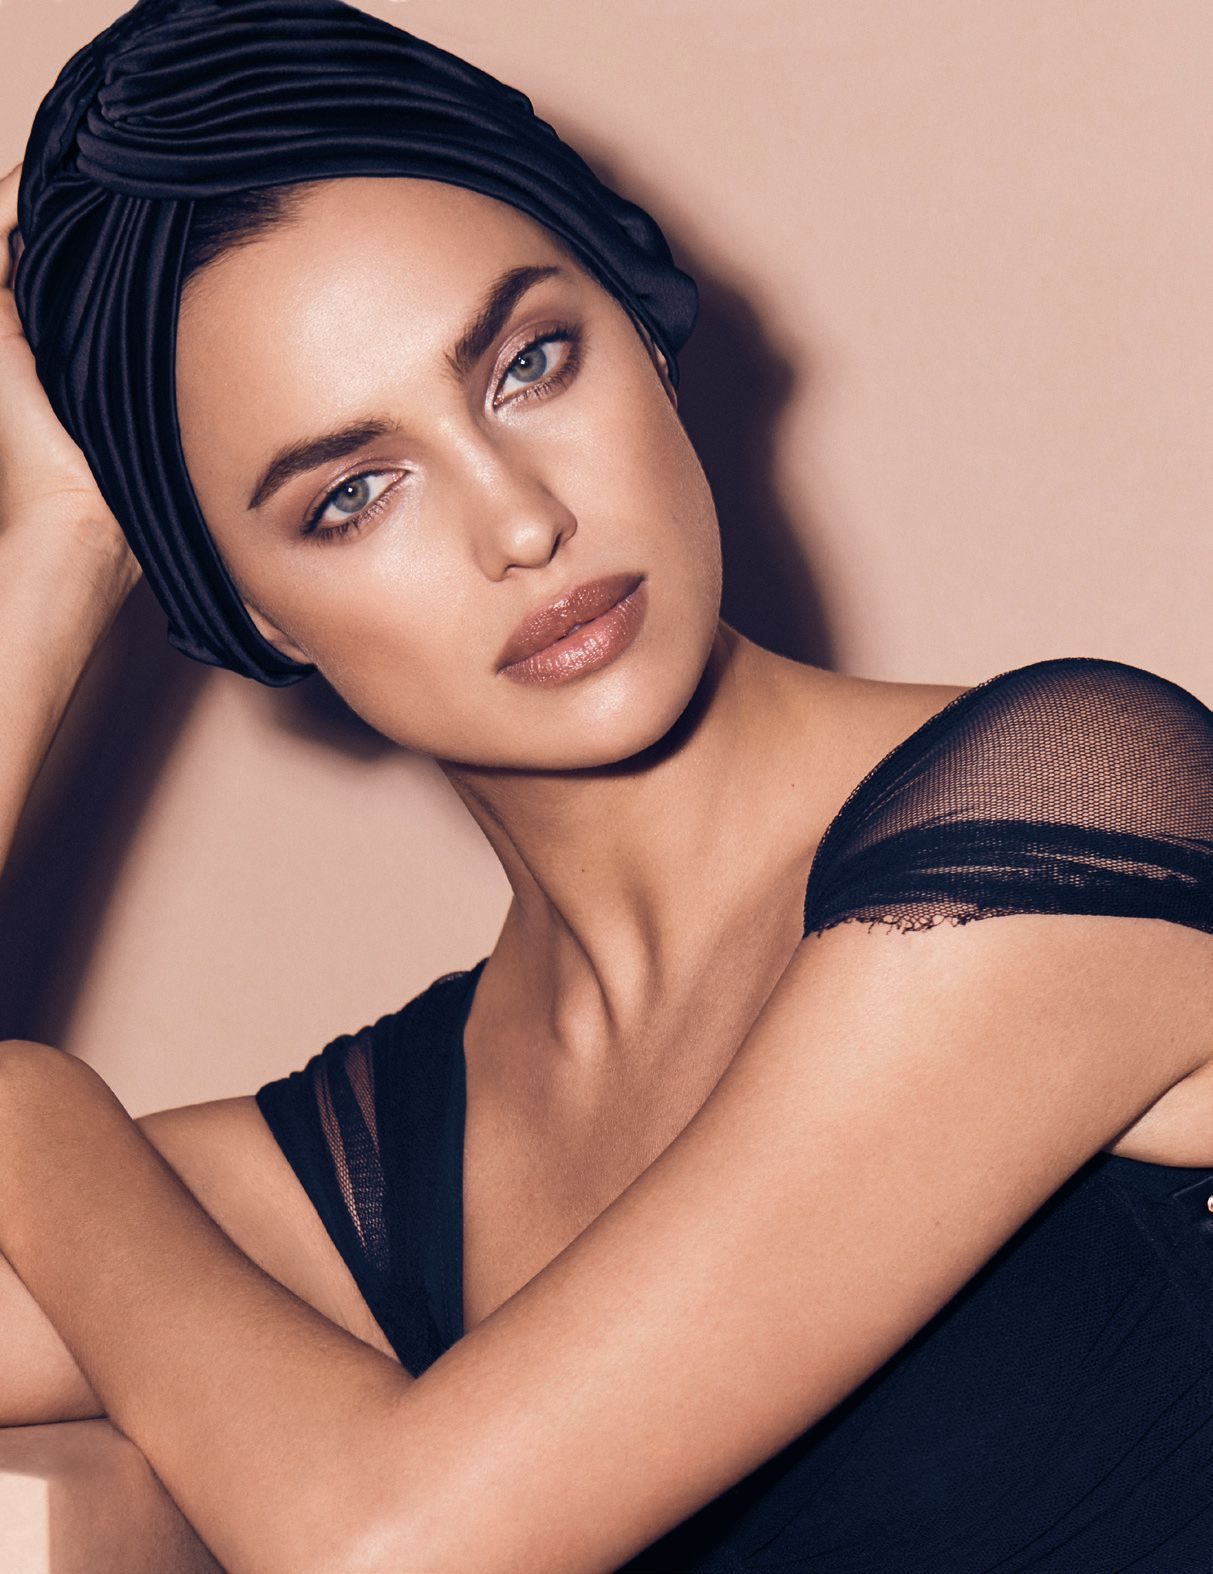 Anna Morozova. 2018-2019 celebrityes photos leaks!